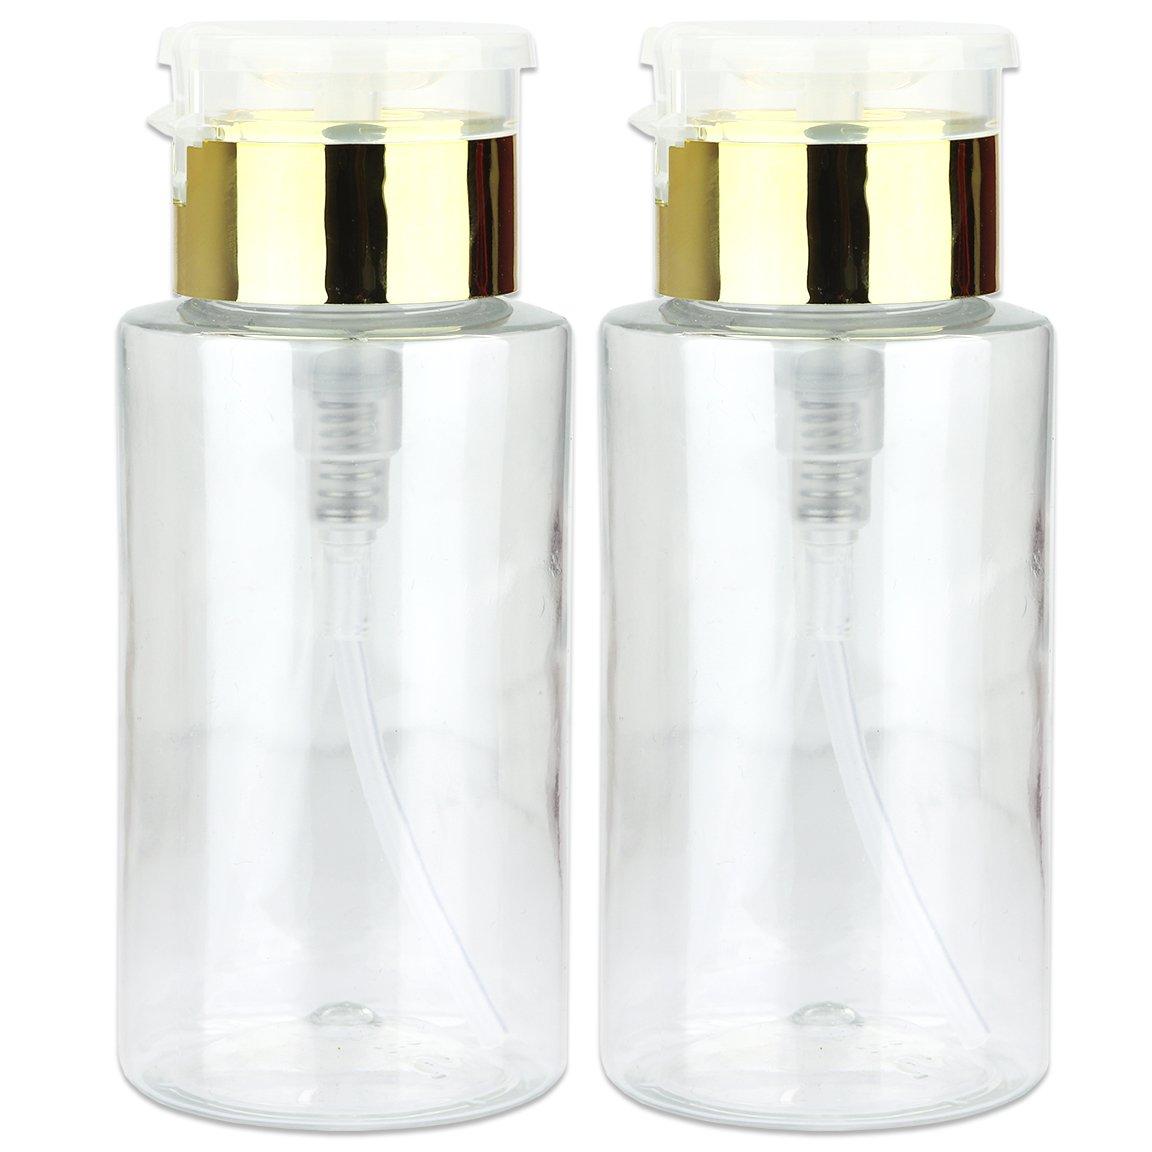 PANA Brand 7oz. (Quantity: 2 Pieces) Professional Push Down Liquid Pumping Bottle Dispenser (Gold Lid Clear Bottle, NO WORDING!!)